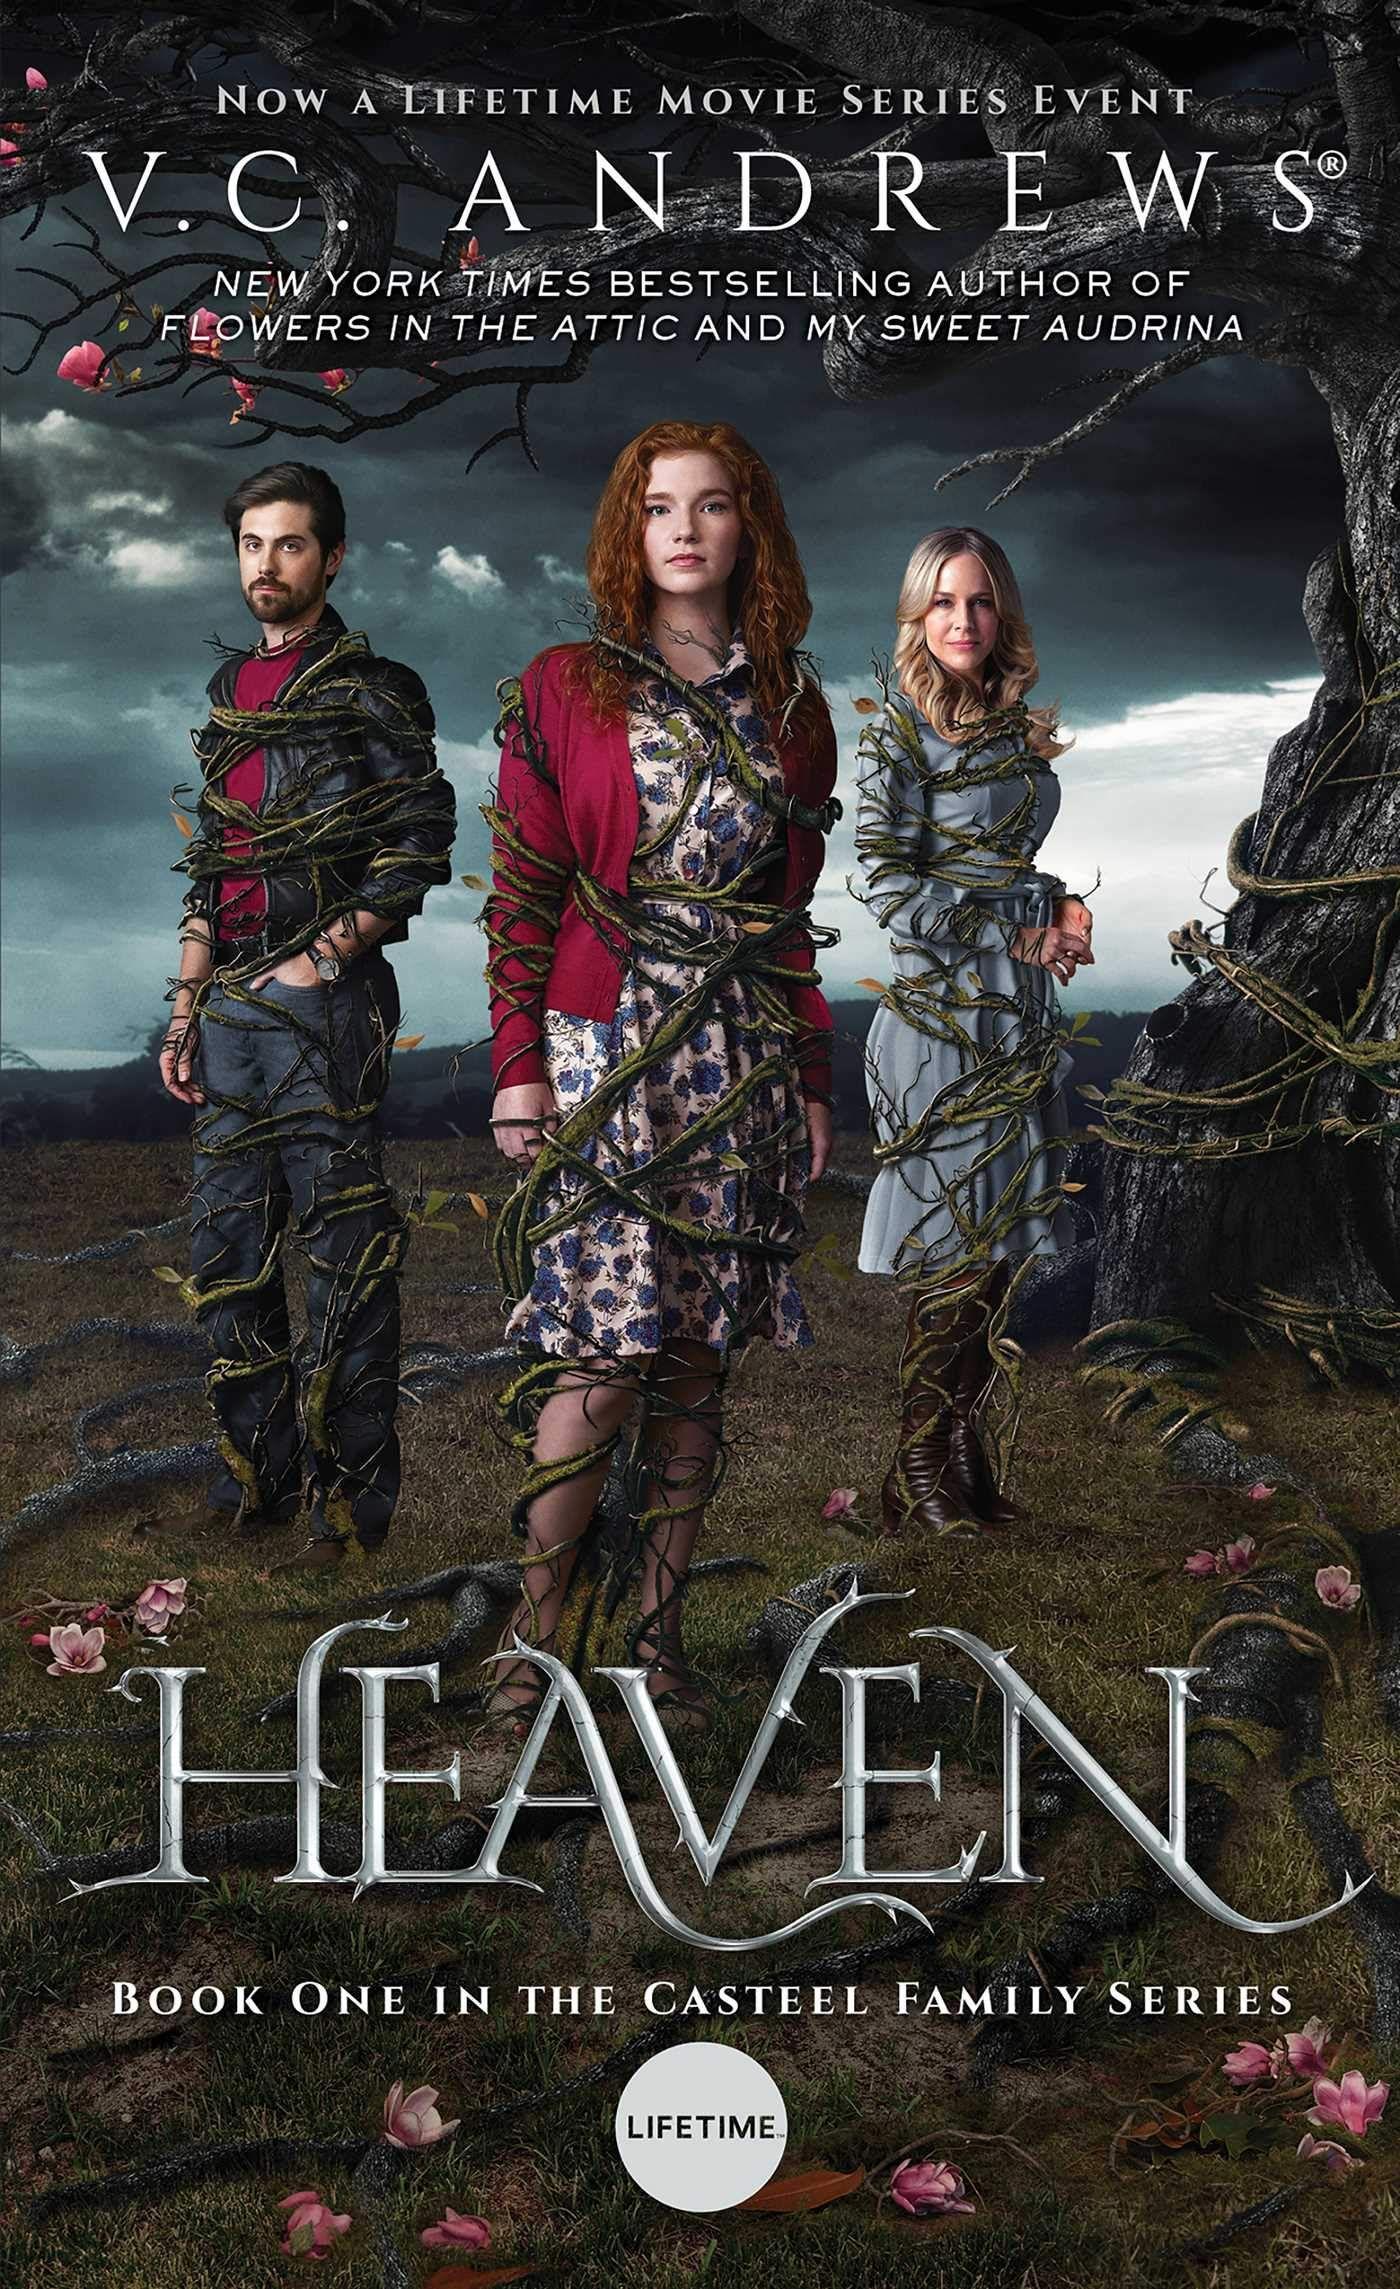 Watch Online Fallen Hearts 2019 123movies In 2020 V C Andrews Lifetime Movies Heaven Book